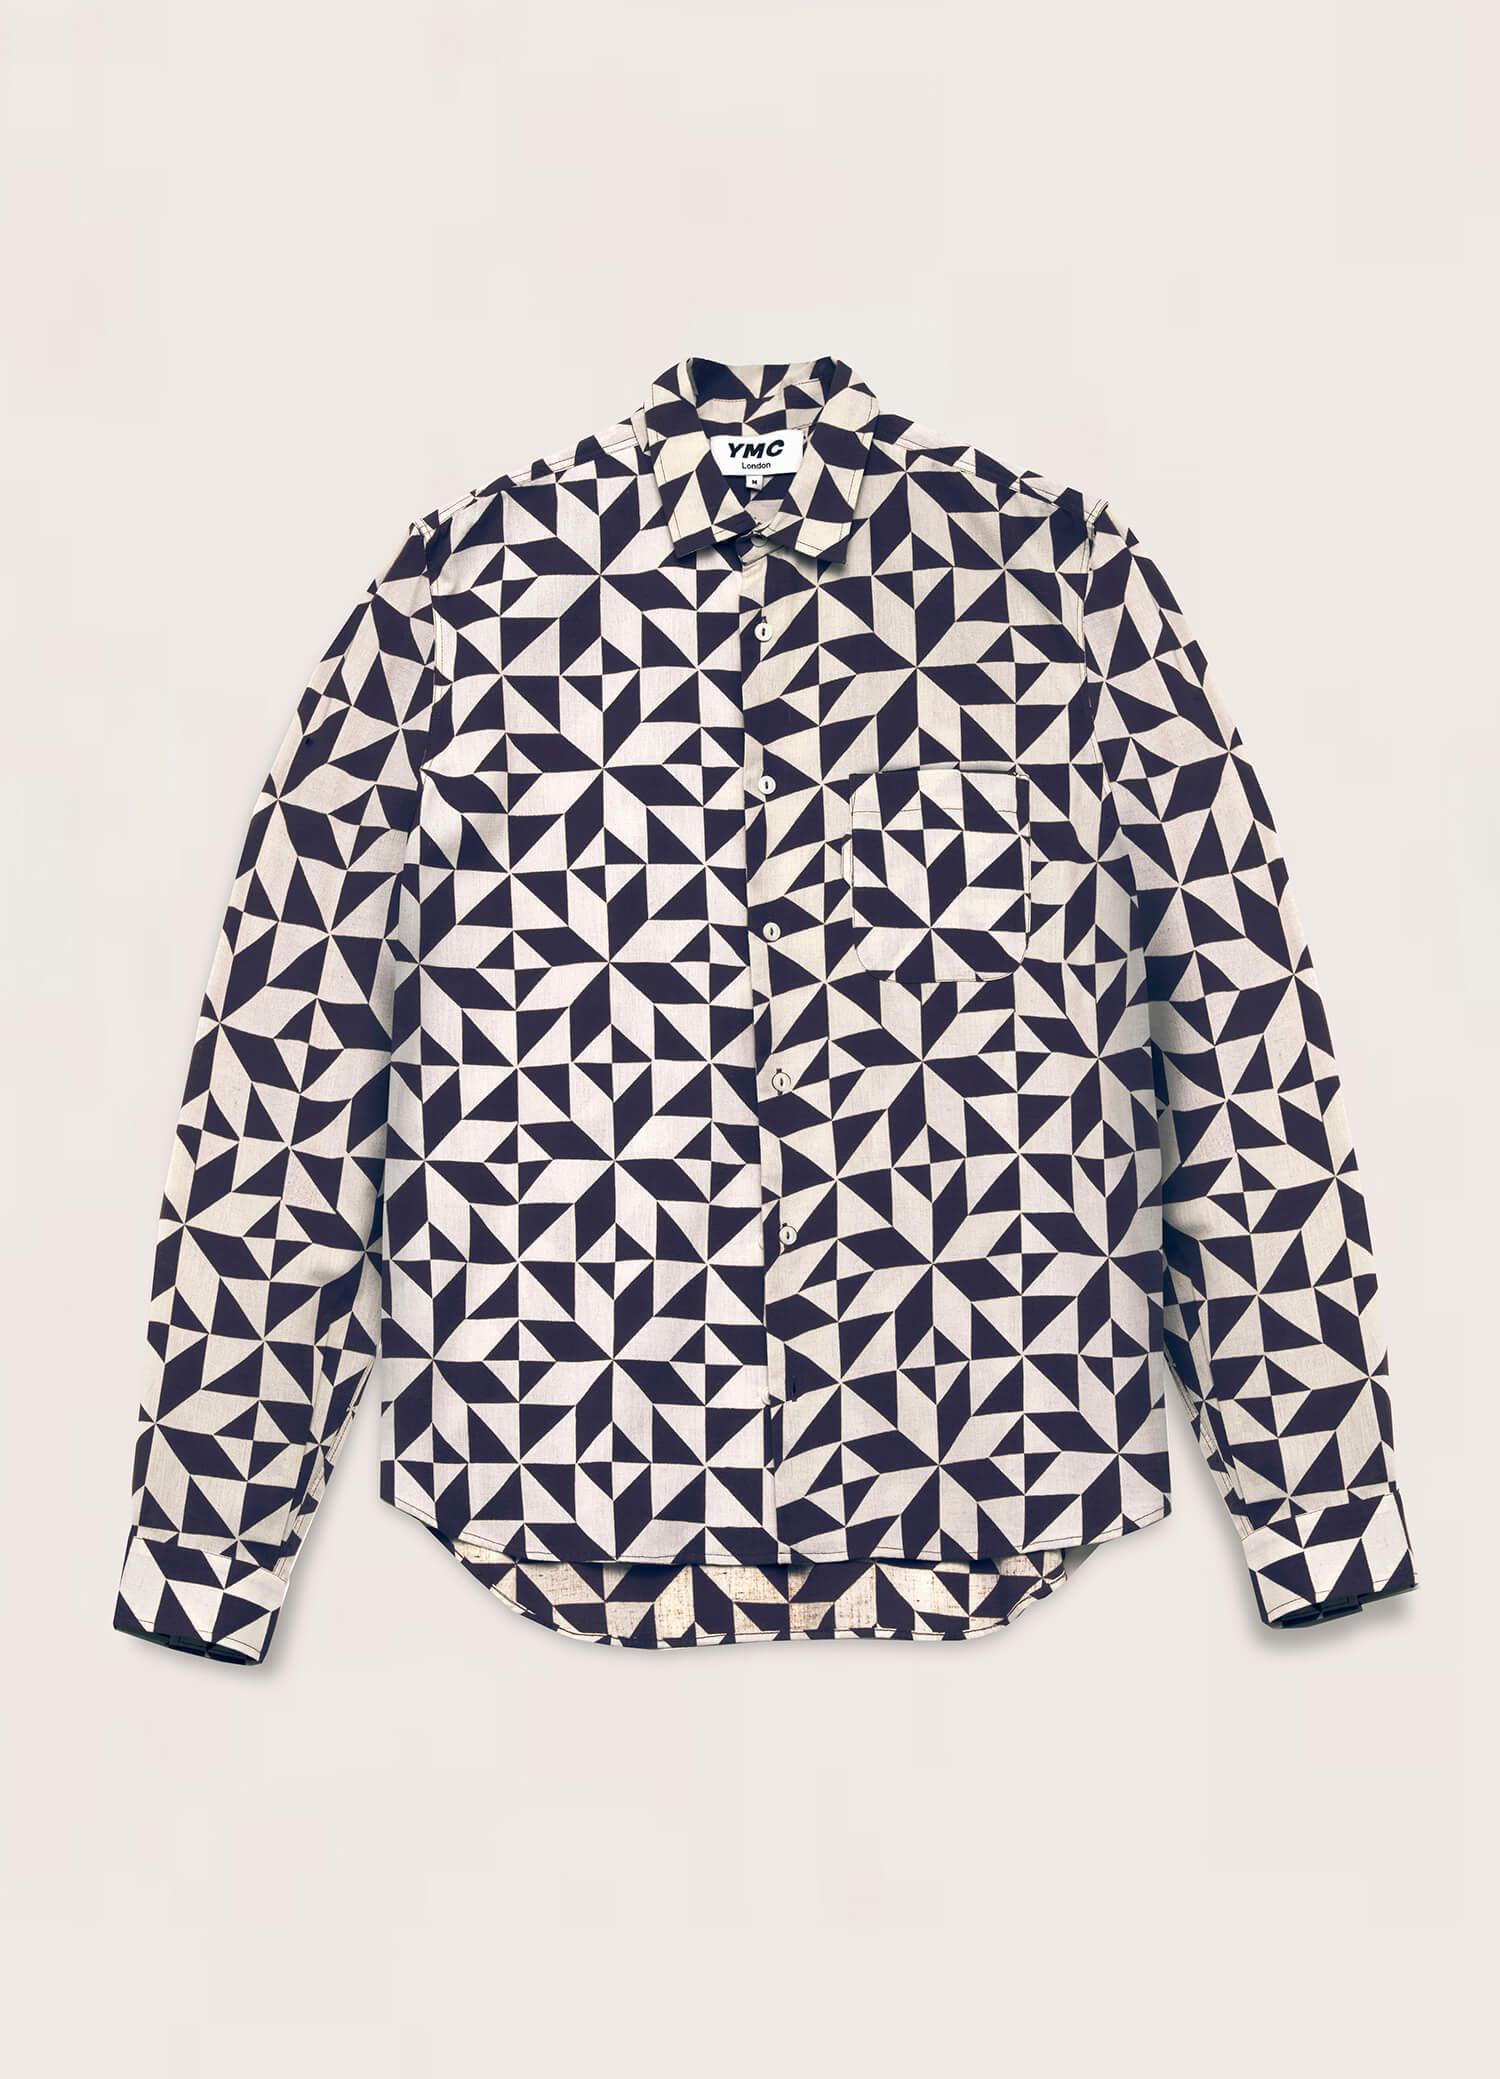 Curtis Cotton Flax Star Tile Print Shirt Blue